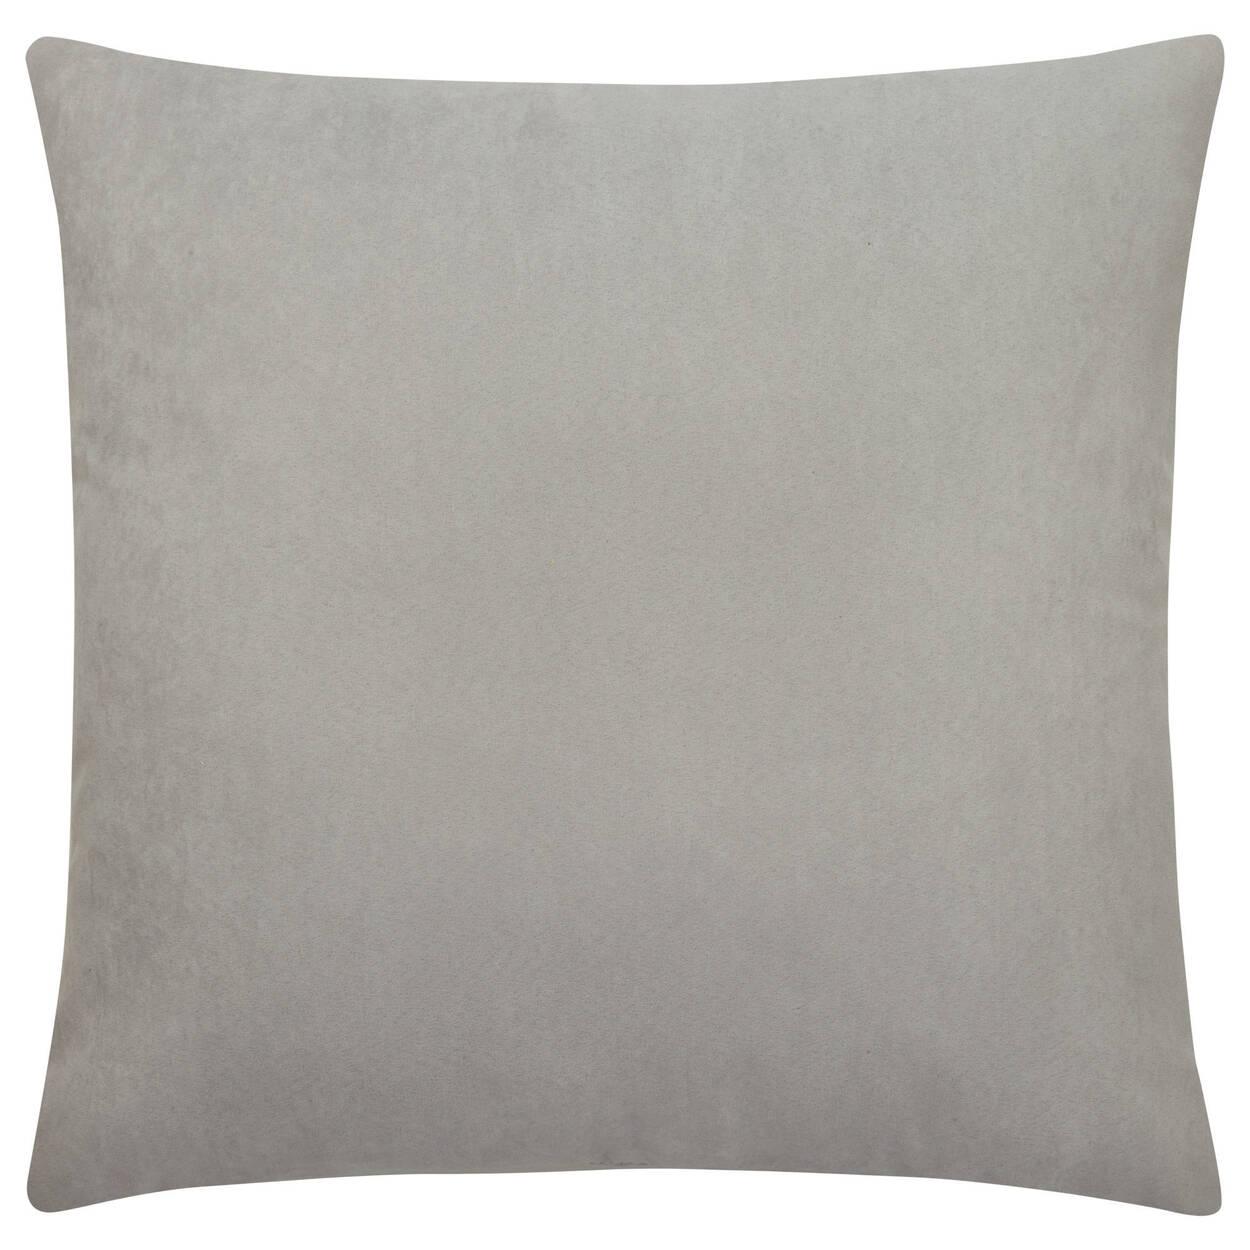 "Garrett Faux Suede Decorative Pillow 22"" X 22"""